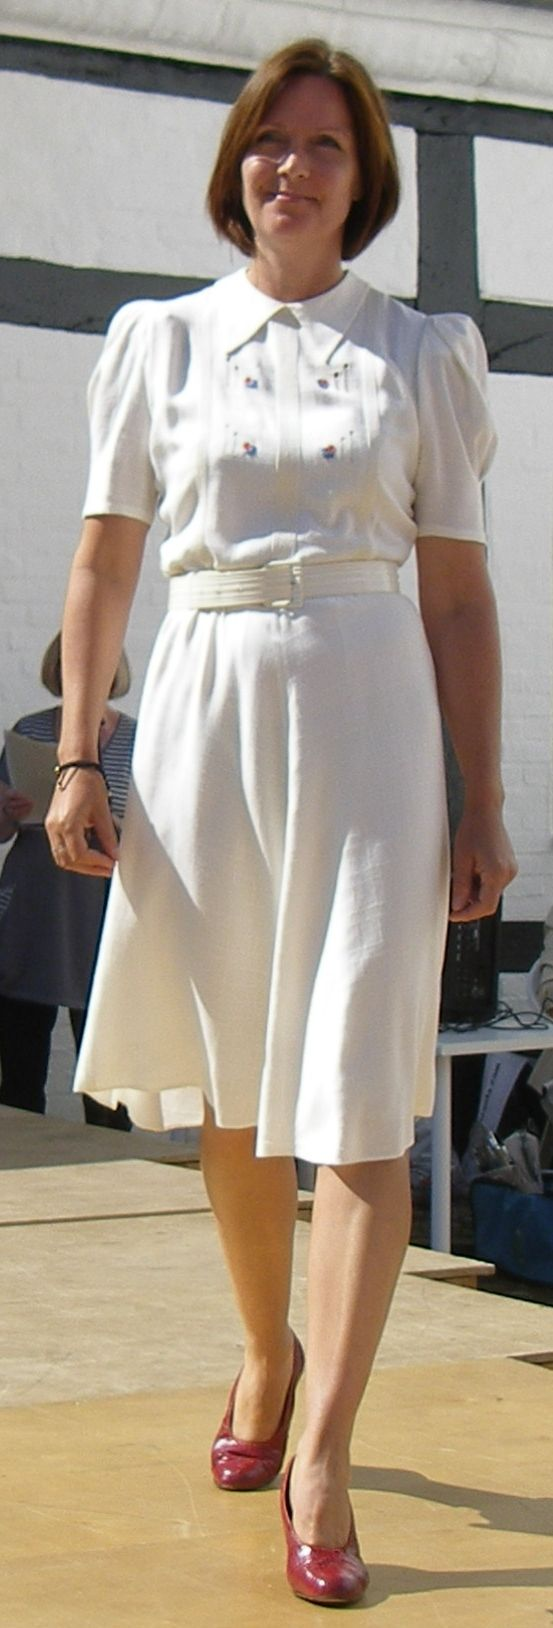 Historisk mode Bratskov 2013.  Kjole fra 1940-50